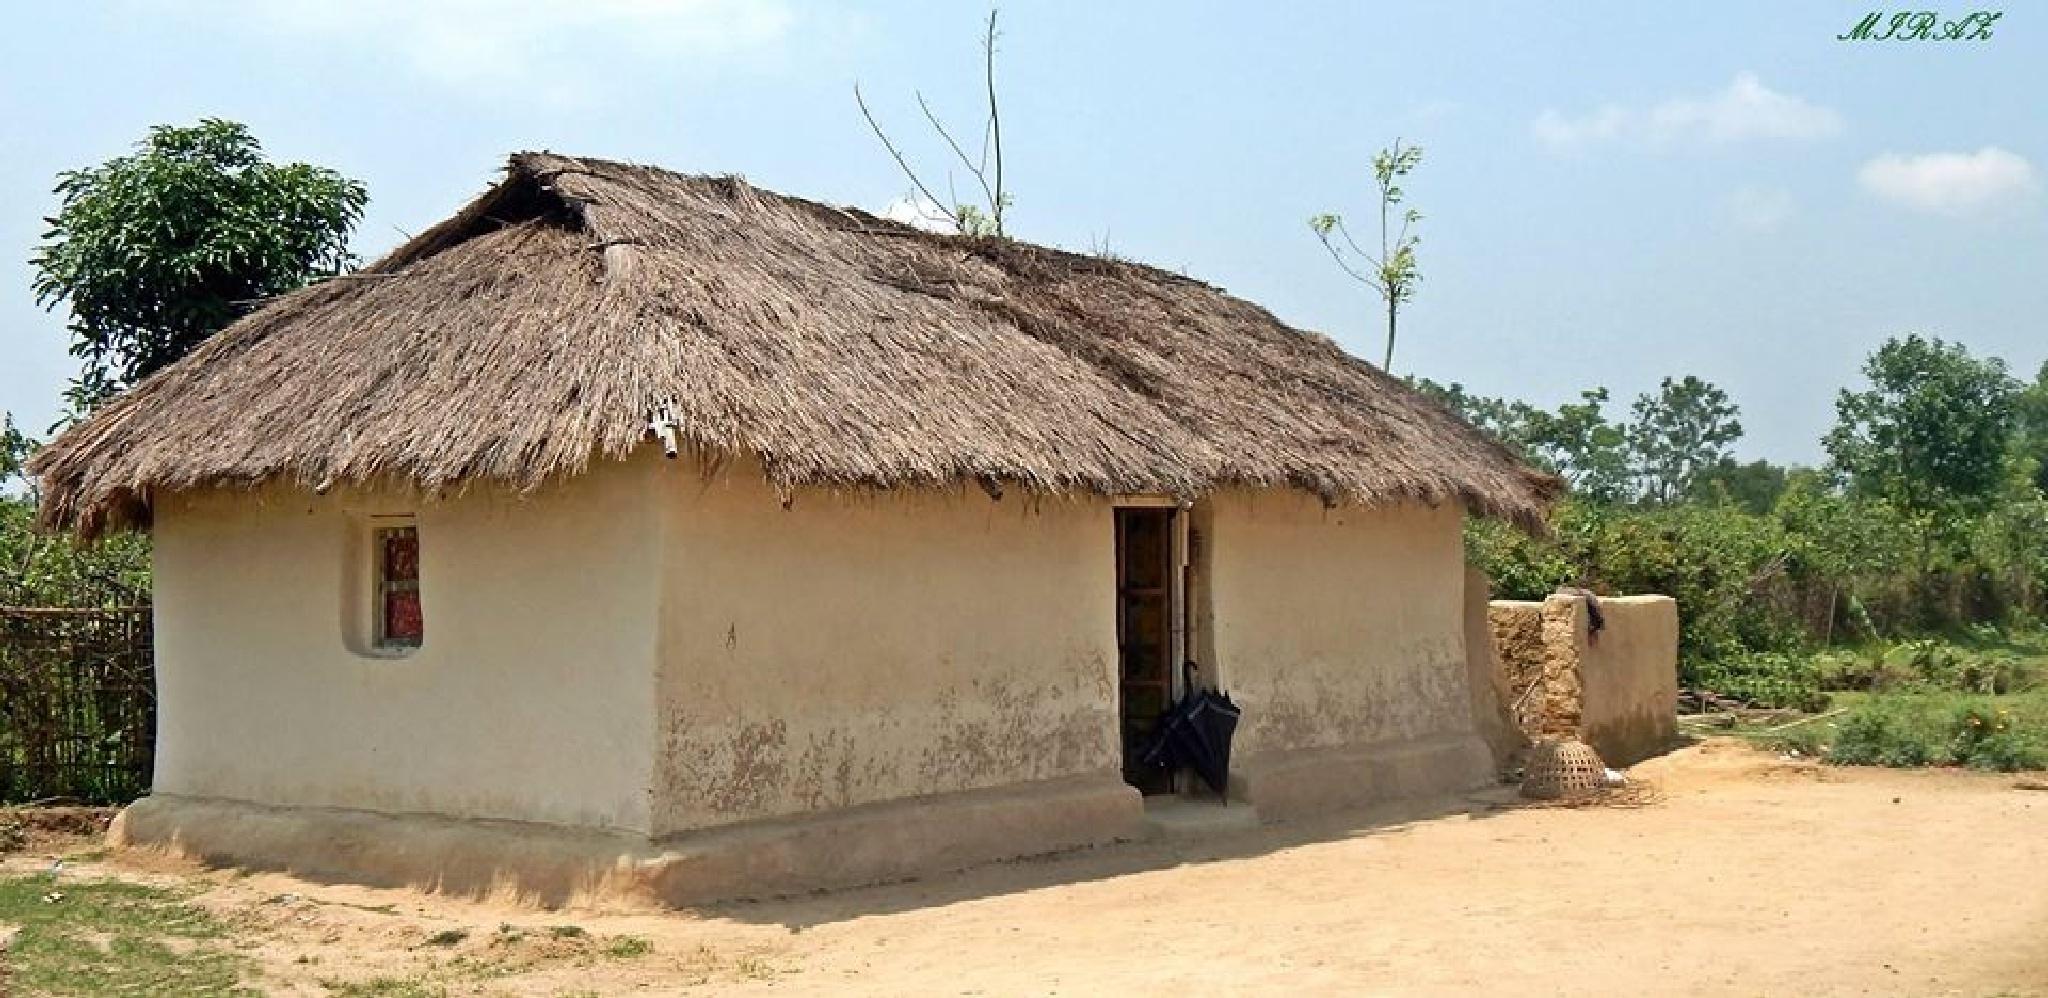 mud house by ahmed kallol